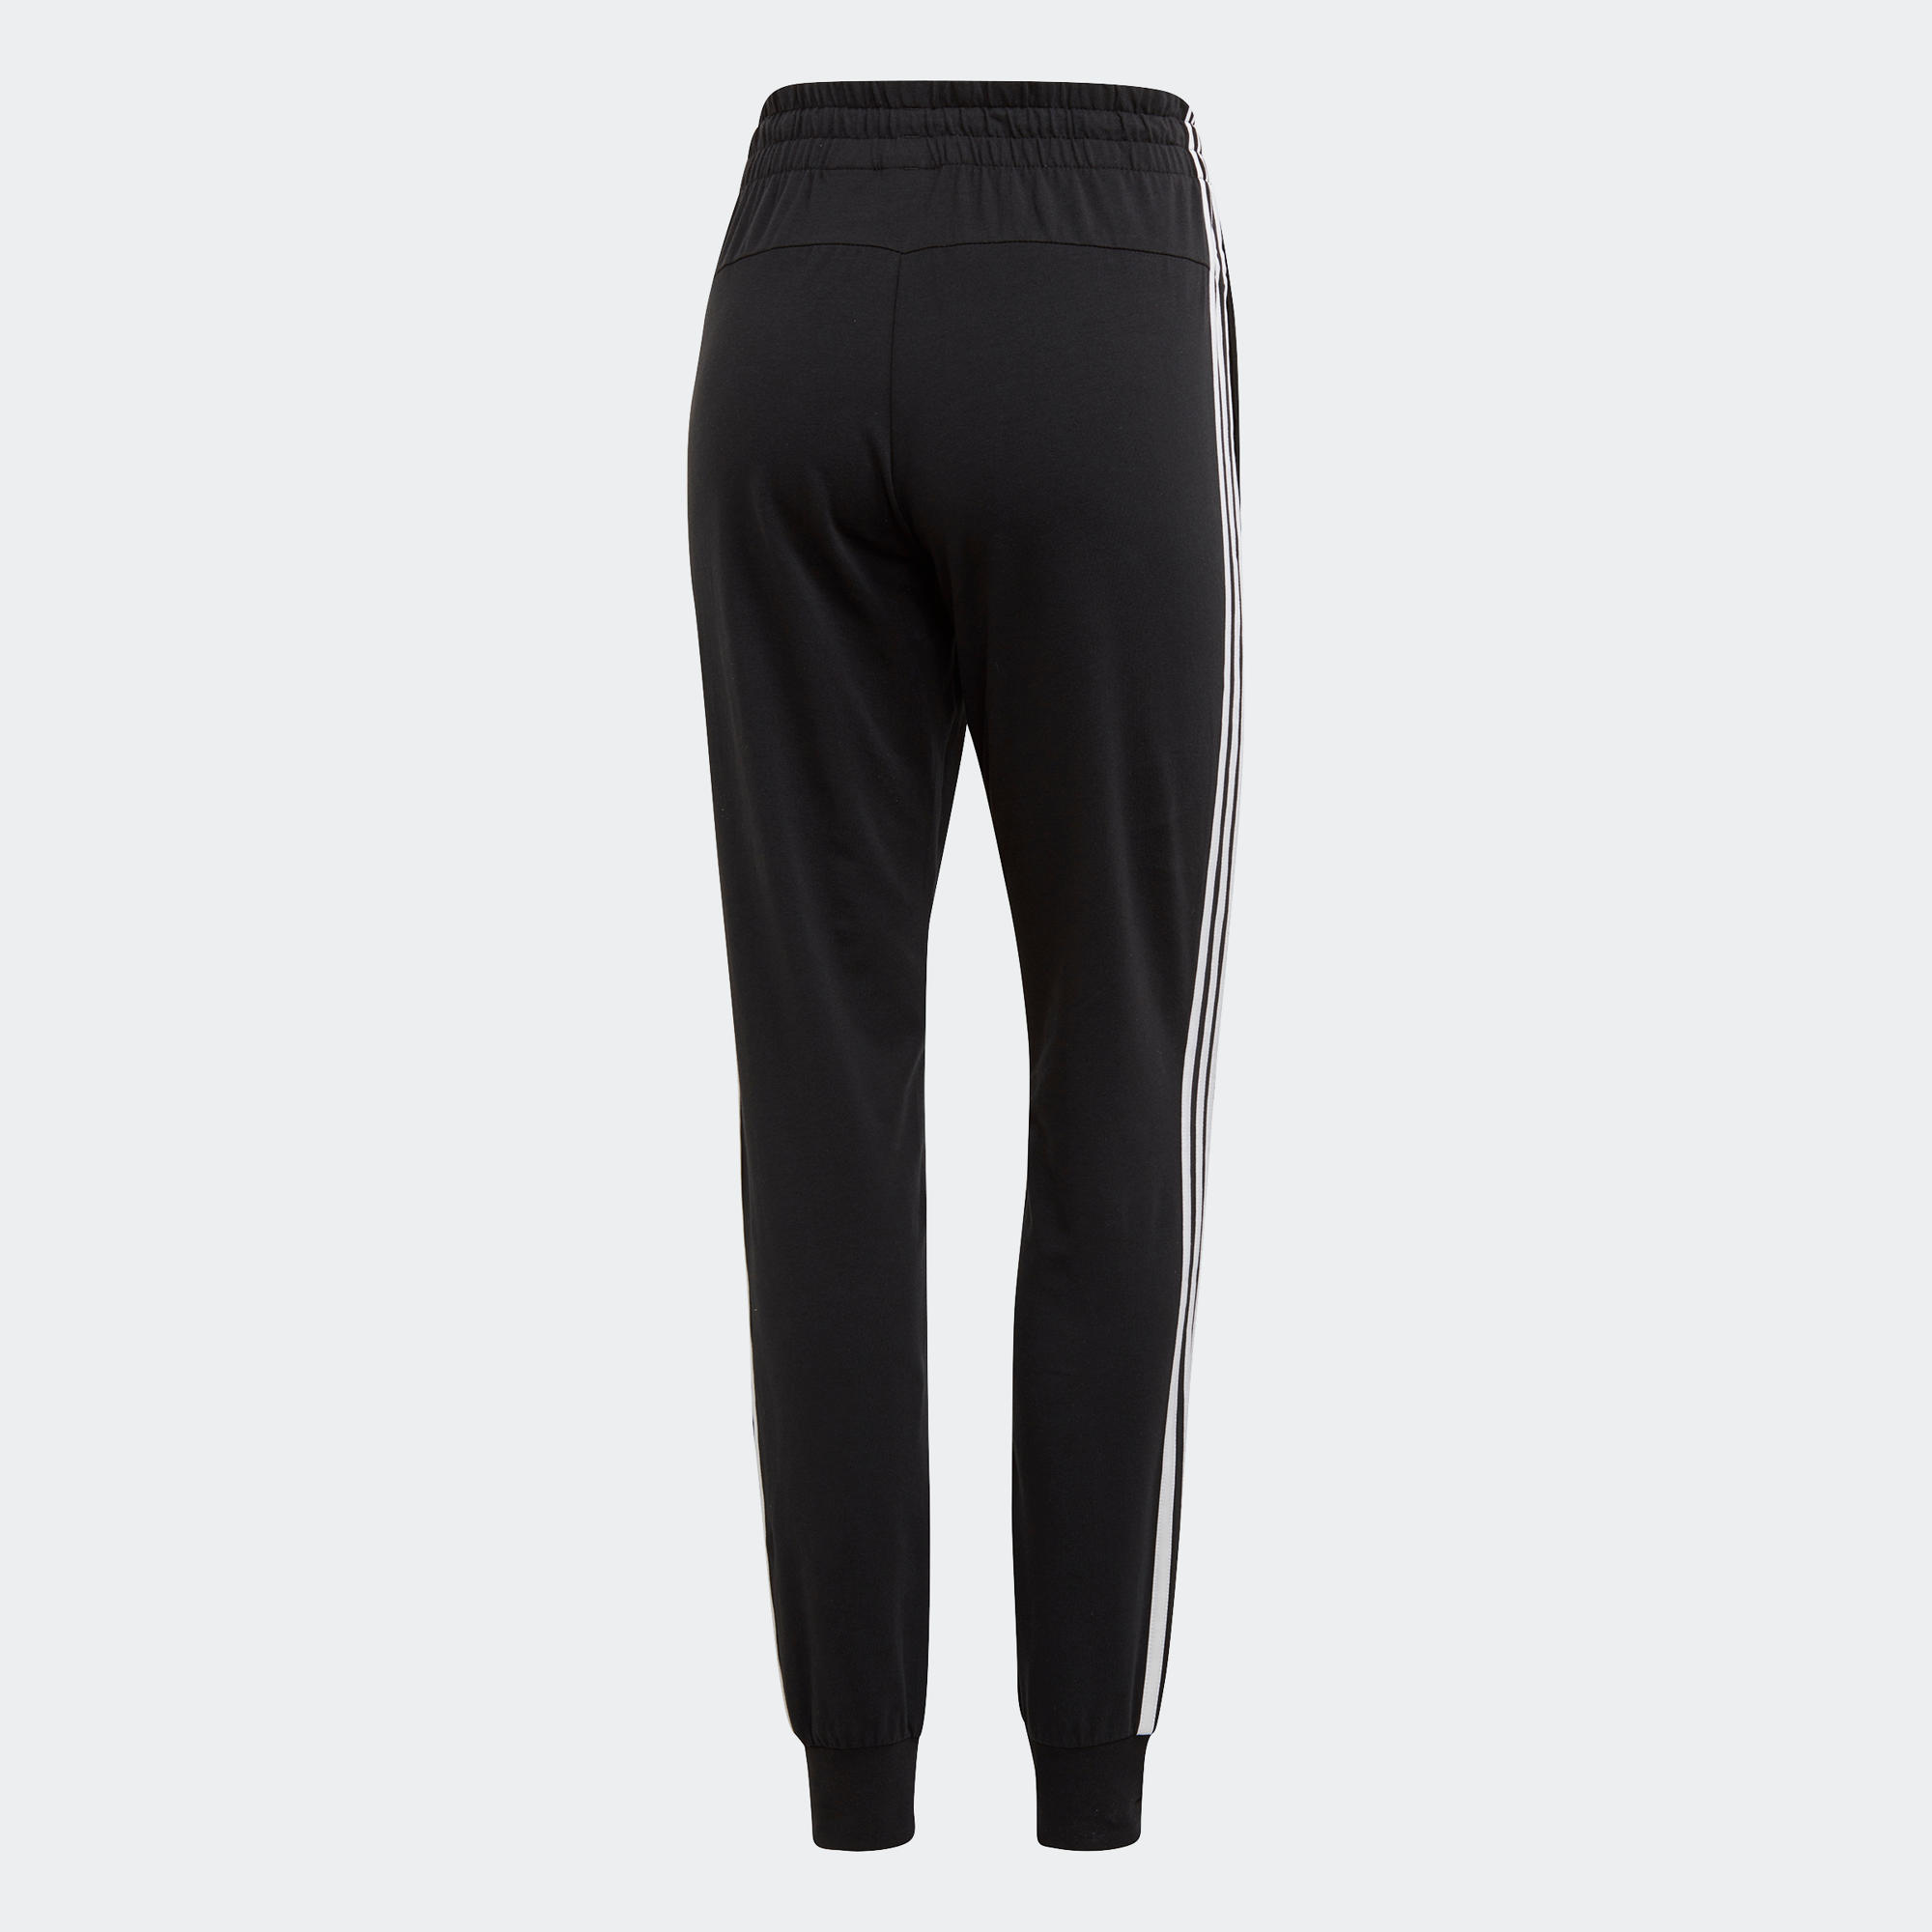 adidas abbigliamento donna pantaloni